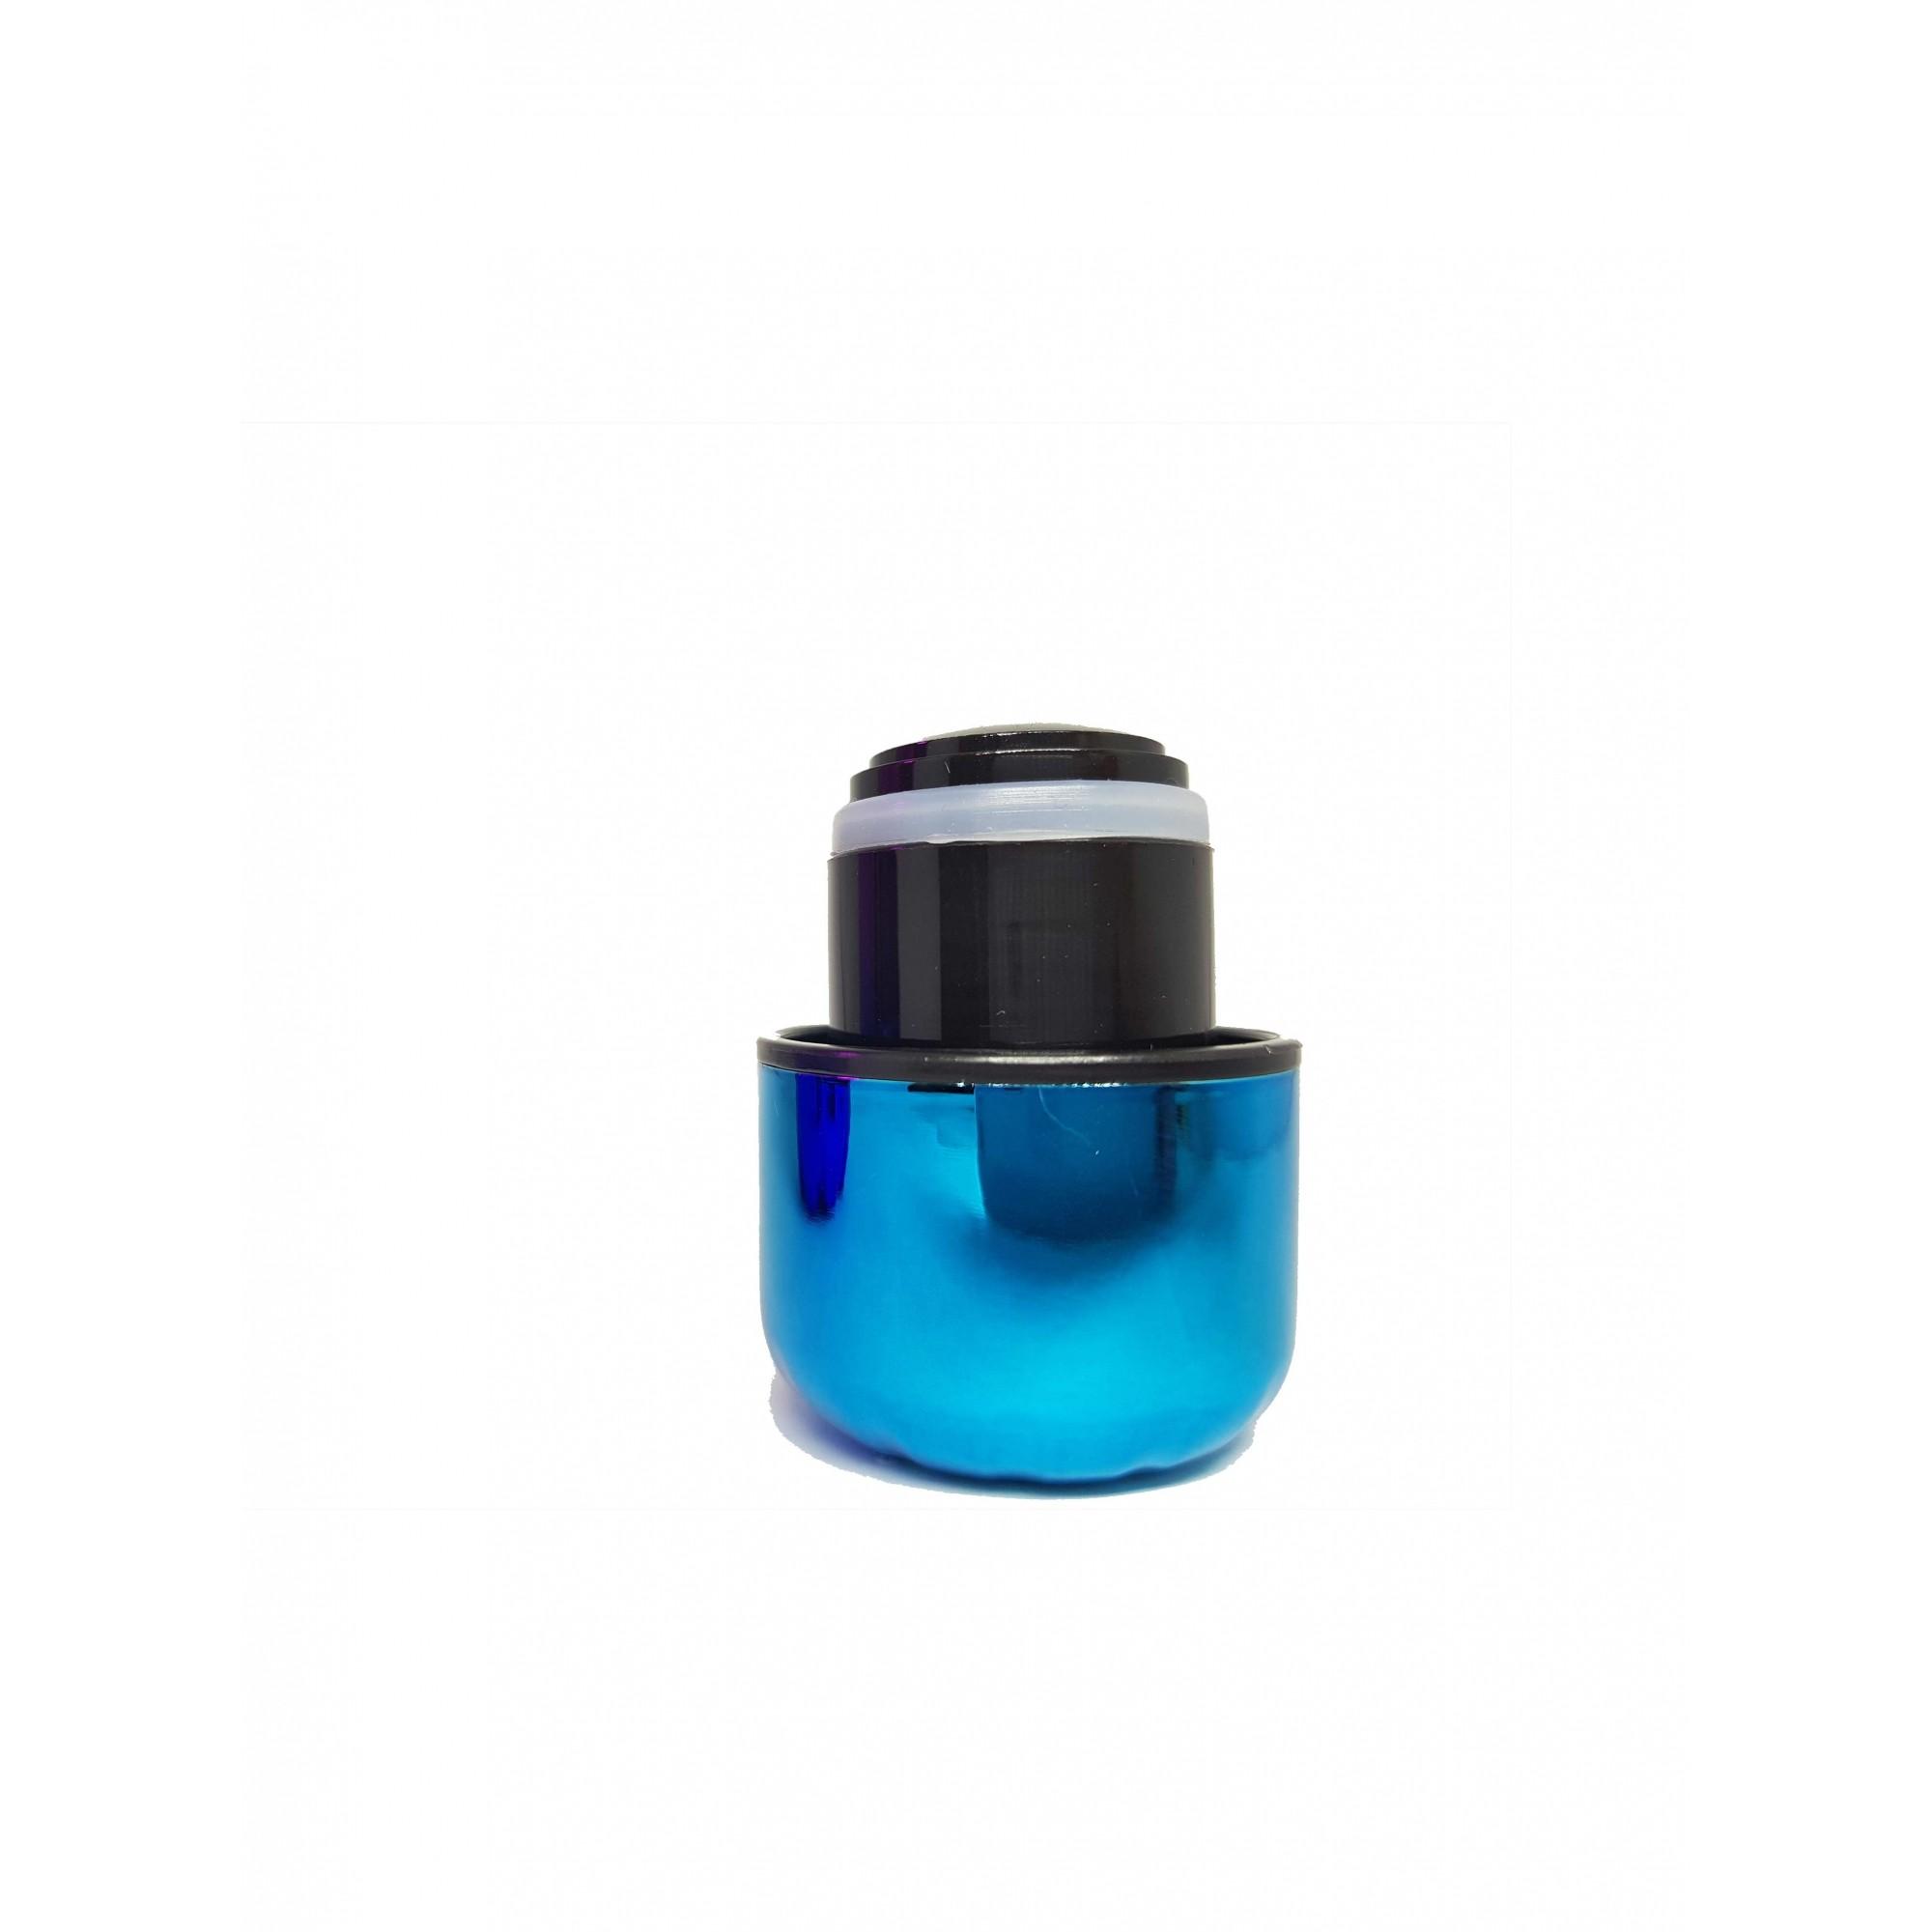 Kit Mundo Bolsa papel + garrafa Holográfica + kit 5 em 1 inox